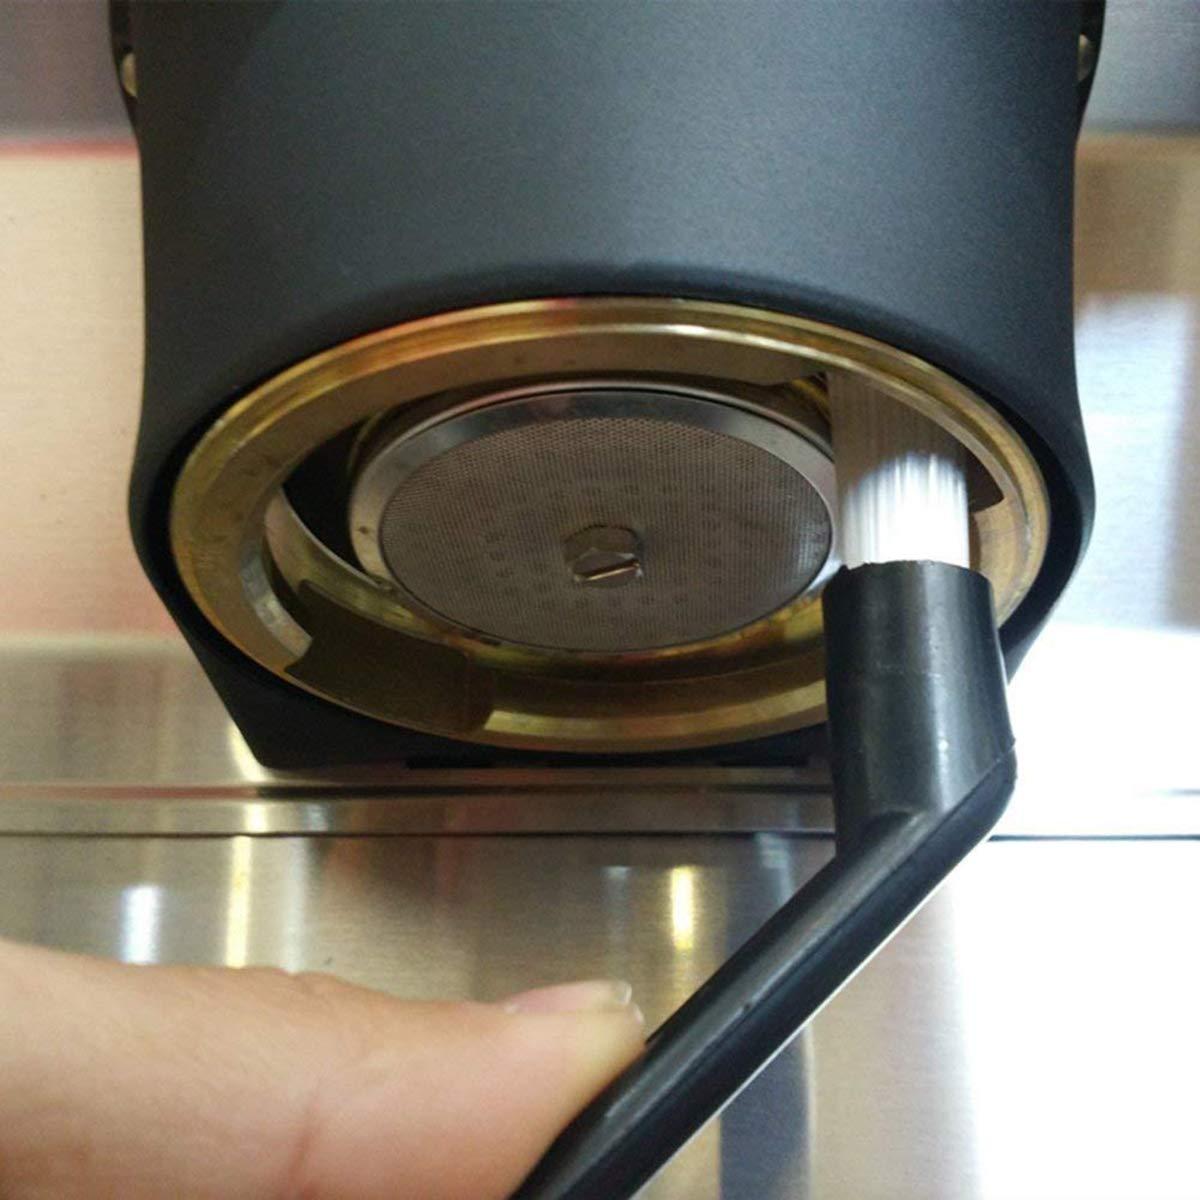 Binchil Caffe Brush Cleaner Macchina Nylon Caffe Espresso Gruppo Machine Head per Pulizia in 2 Pezzi